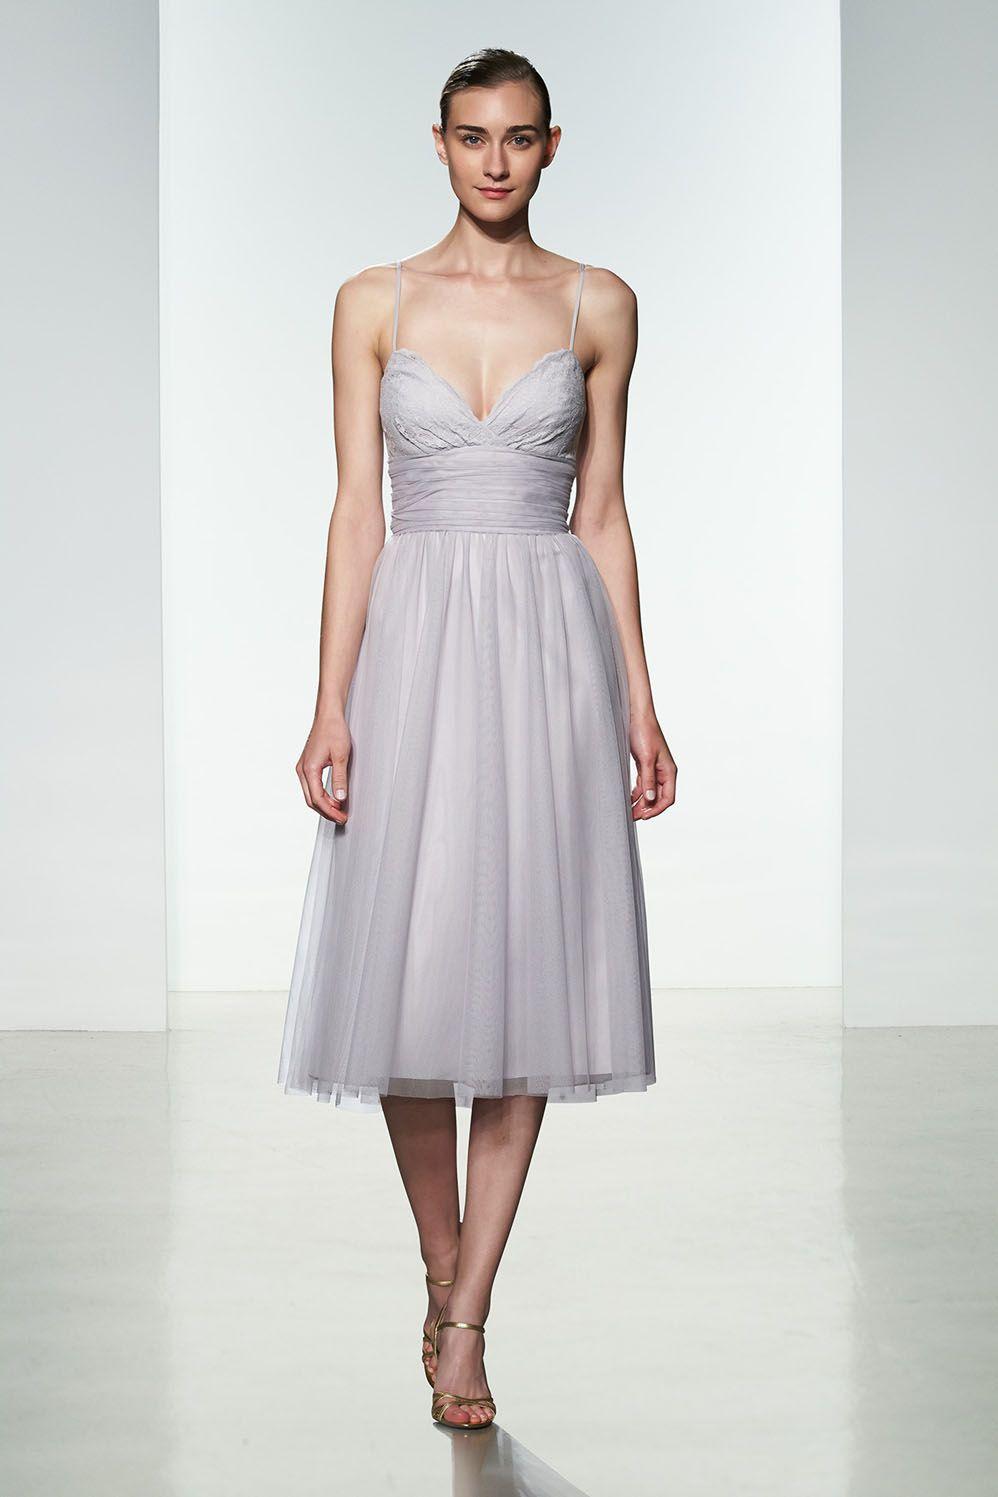 Bridesmaid Dresses, Wedding Dresses, Bridal Gowns | AMSALE ...